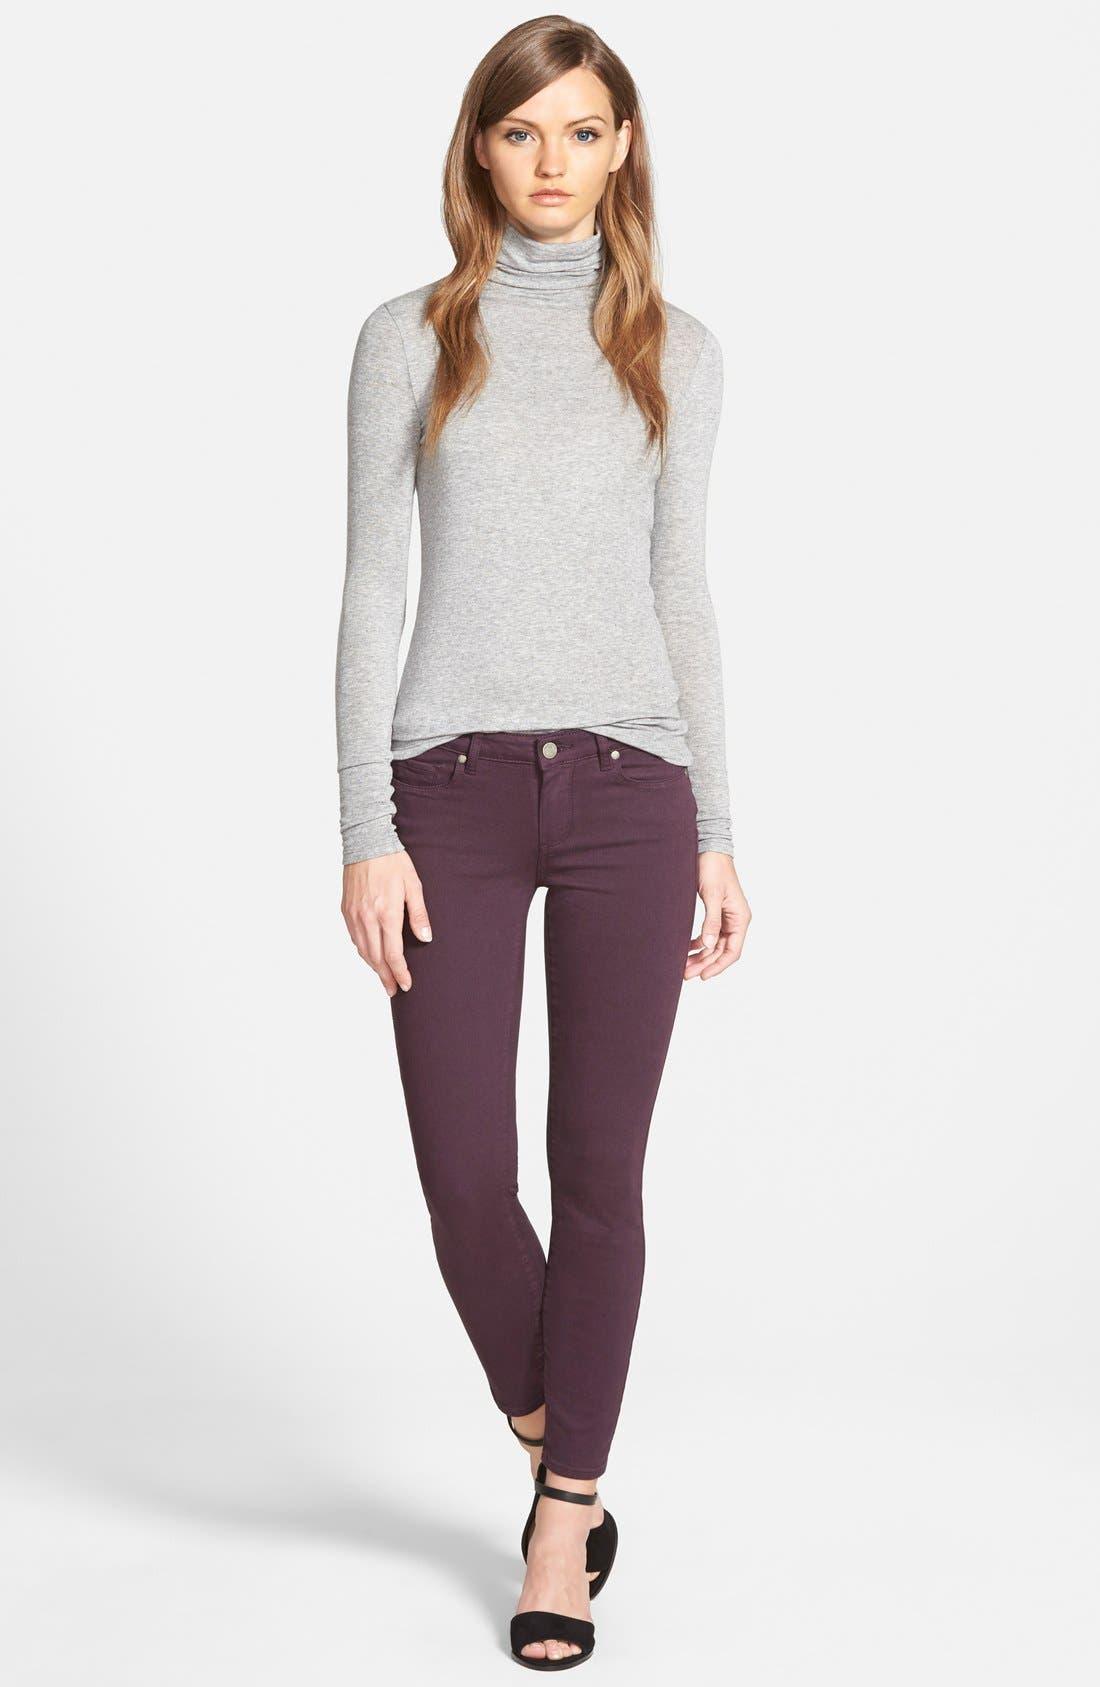 Alternate Image 3  - Paige Denim 'Verdugo' Ankle Skinny Jeans (Autumn Plum) (Nordstrom Exclusive)